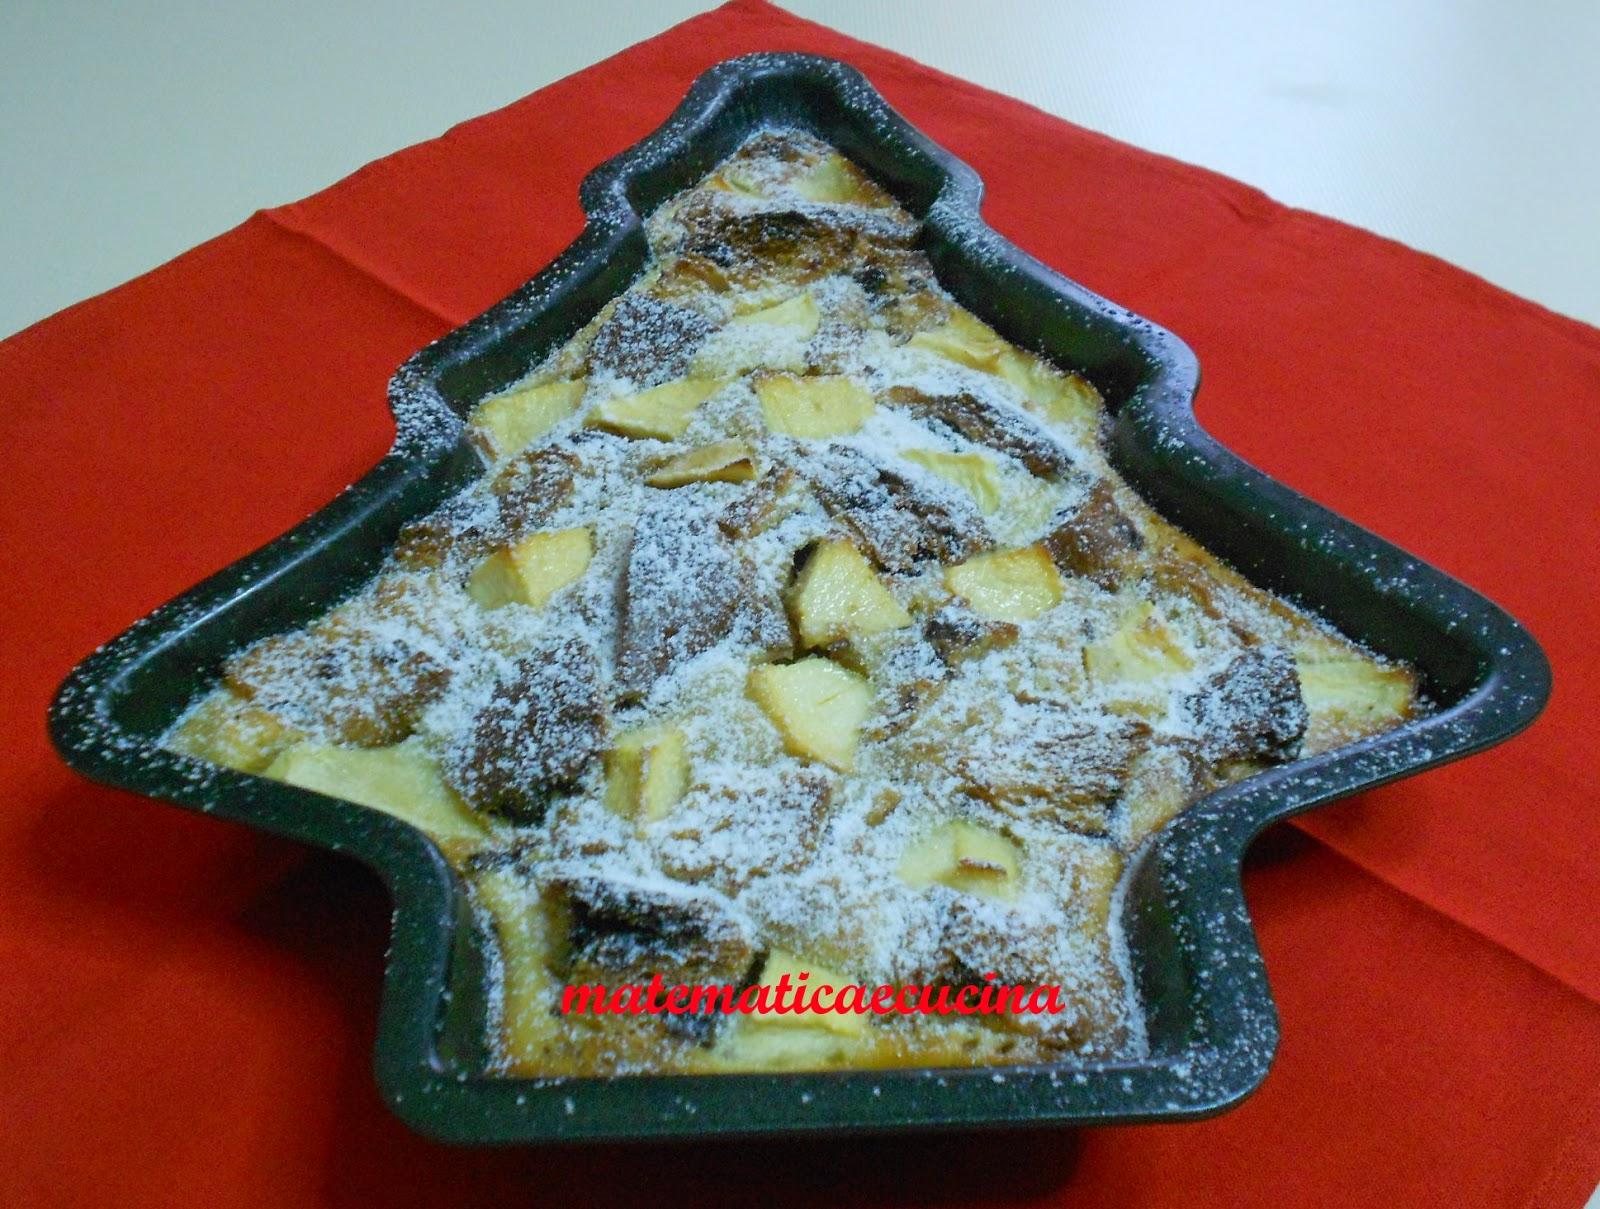 clafoutis di mele e panettone per un goloso riciclo e auguri 2015